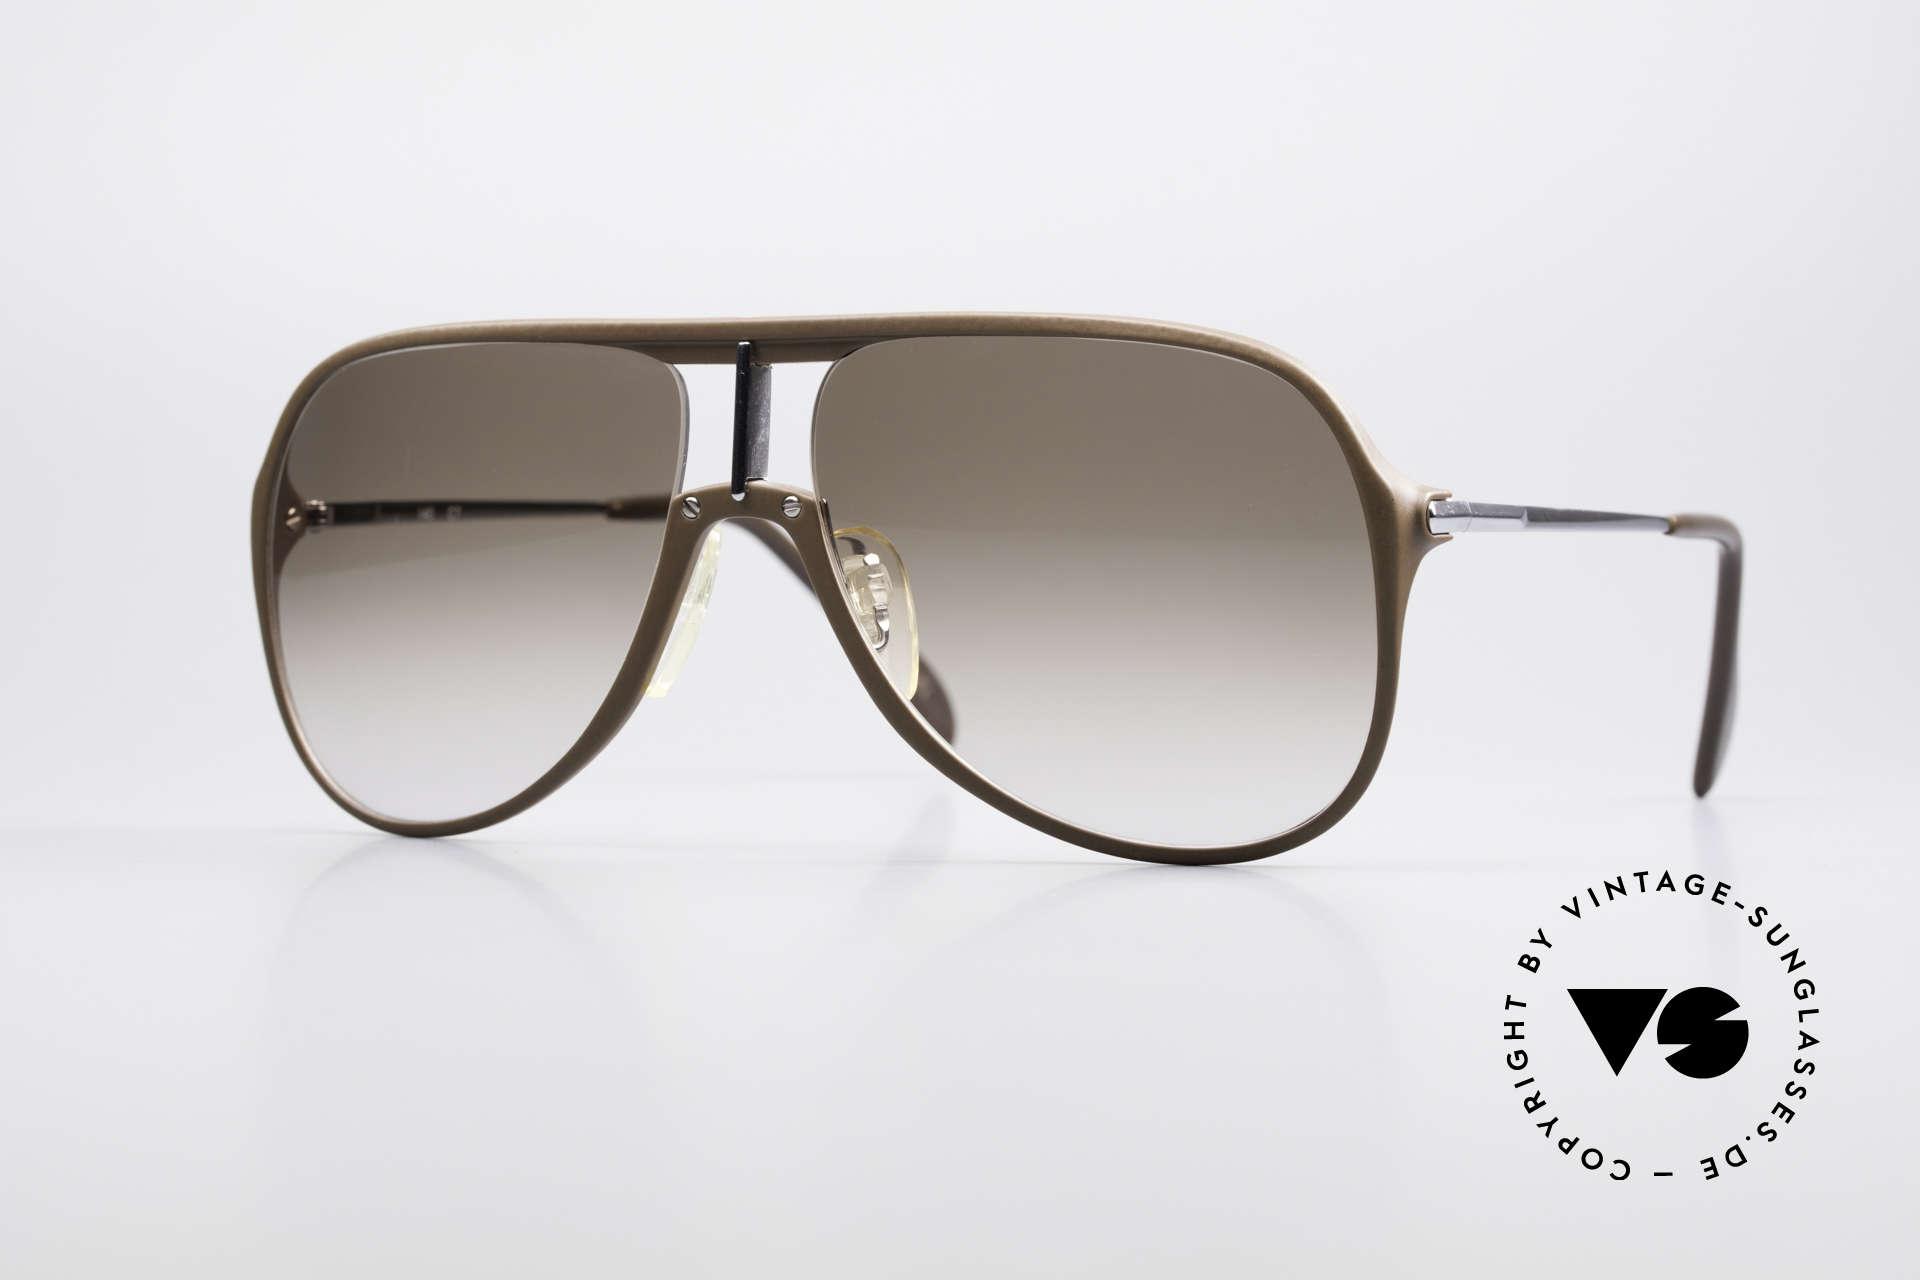 Menrad 727 80's Quality Sunglasses Men, stylish elegant vintage sunglasses by MENRAD, Made for Men